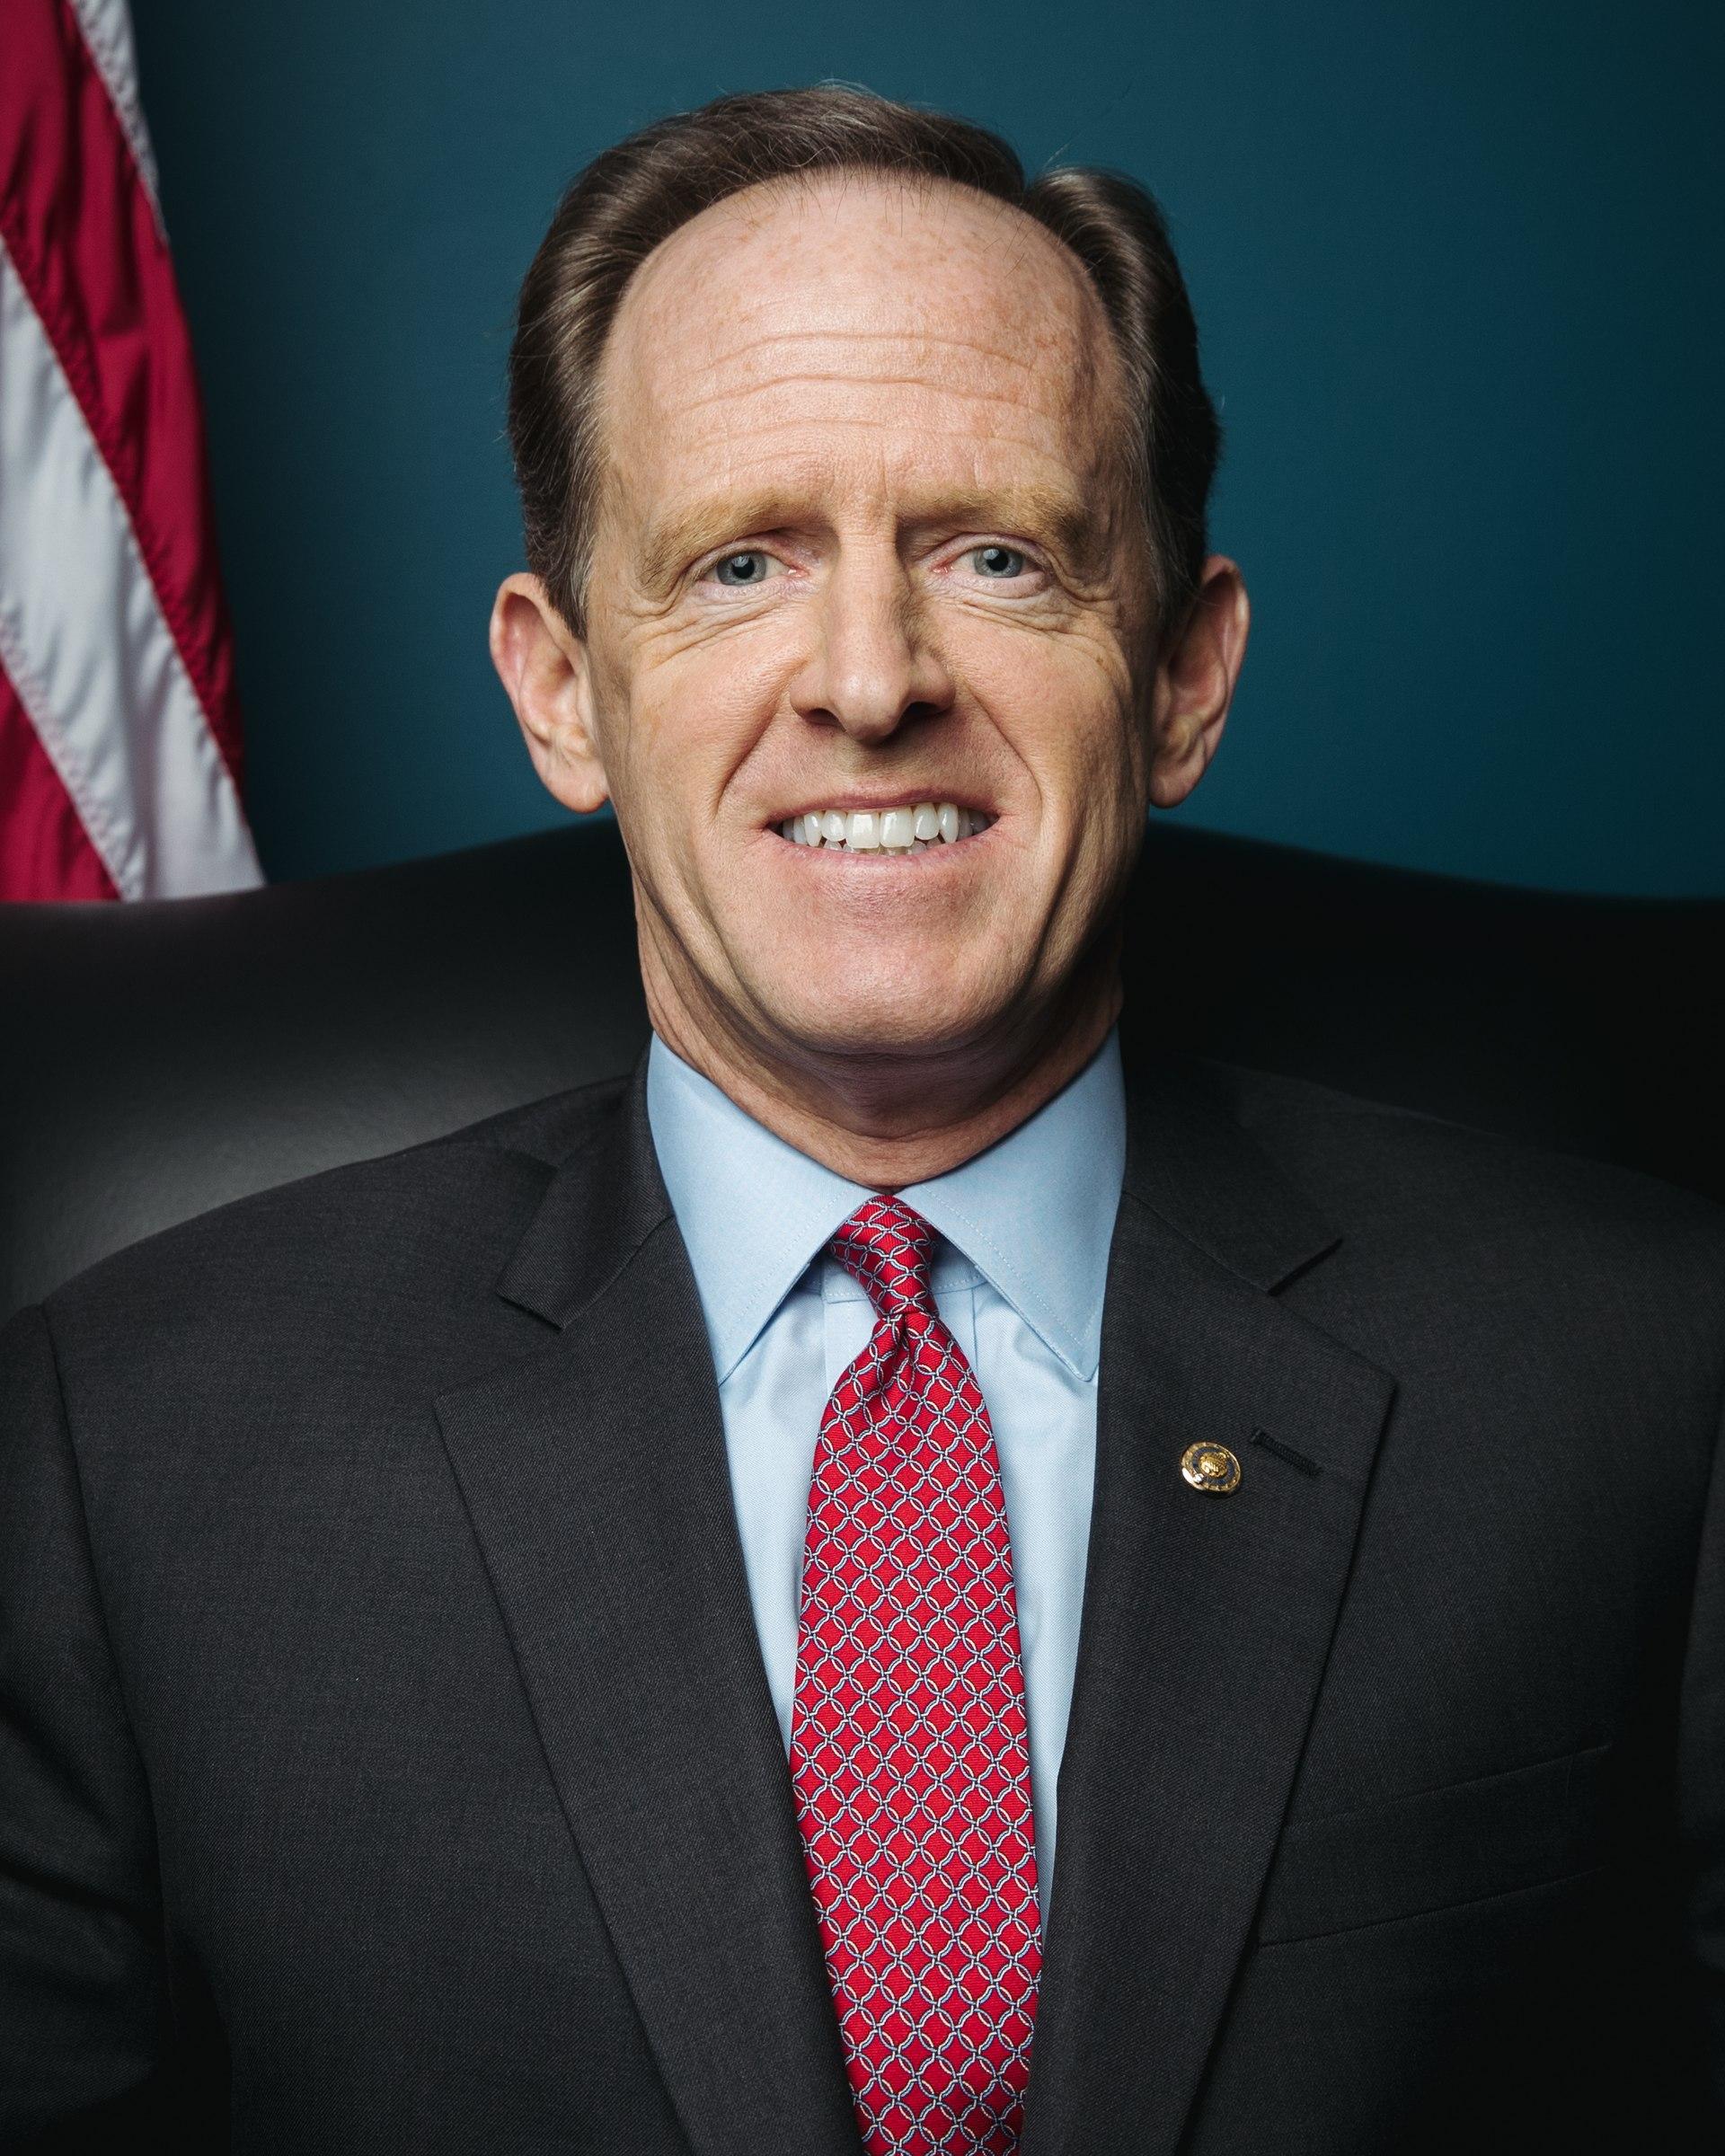 Pat Toomey Congressional portrait